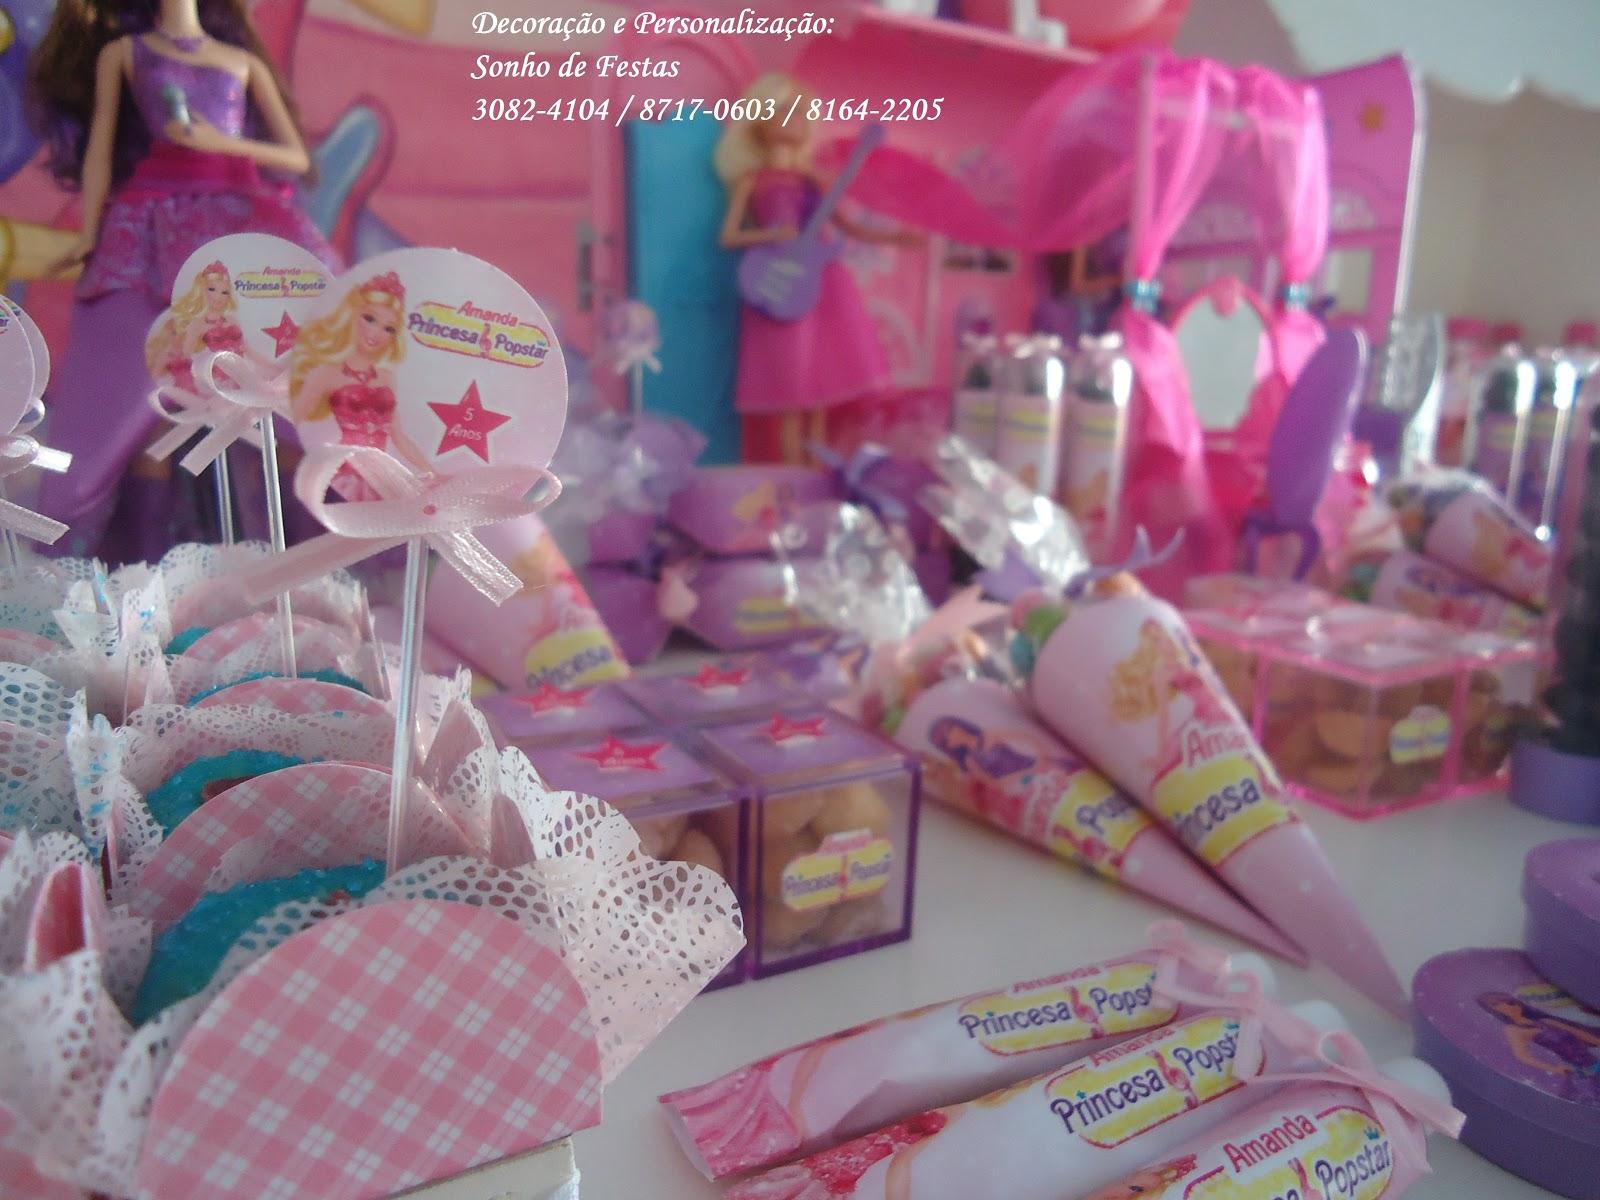 http://1.bp.blogspot.com/-H9jcc5XU300/UJzhQ9UAApI/AAAAAAAAA8I/aeqVLLRfzaA/s1600/barbie%20pop11.jpg